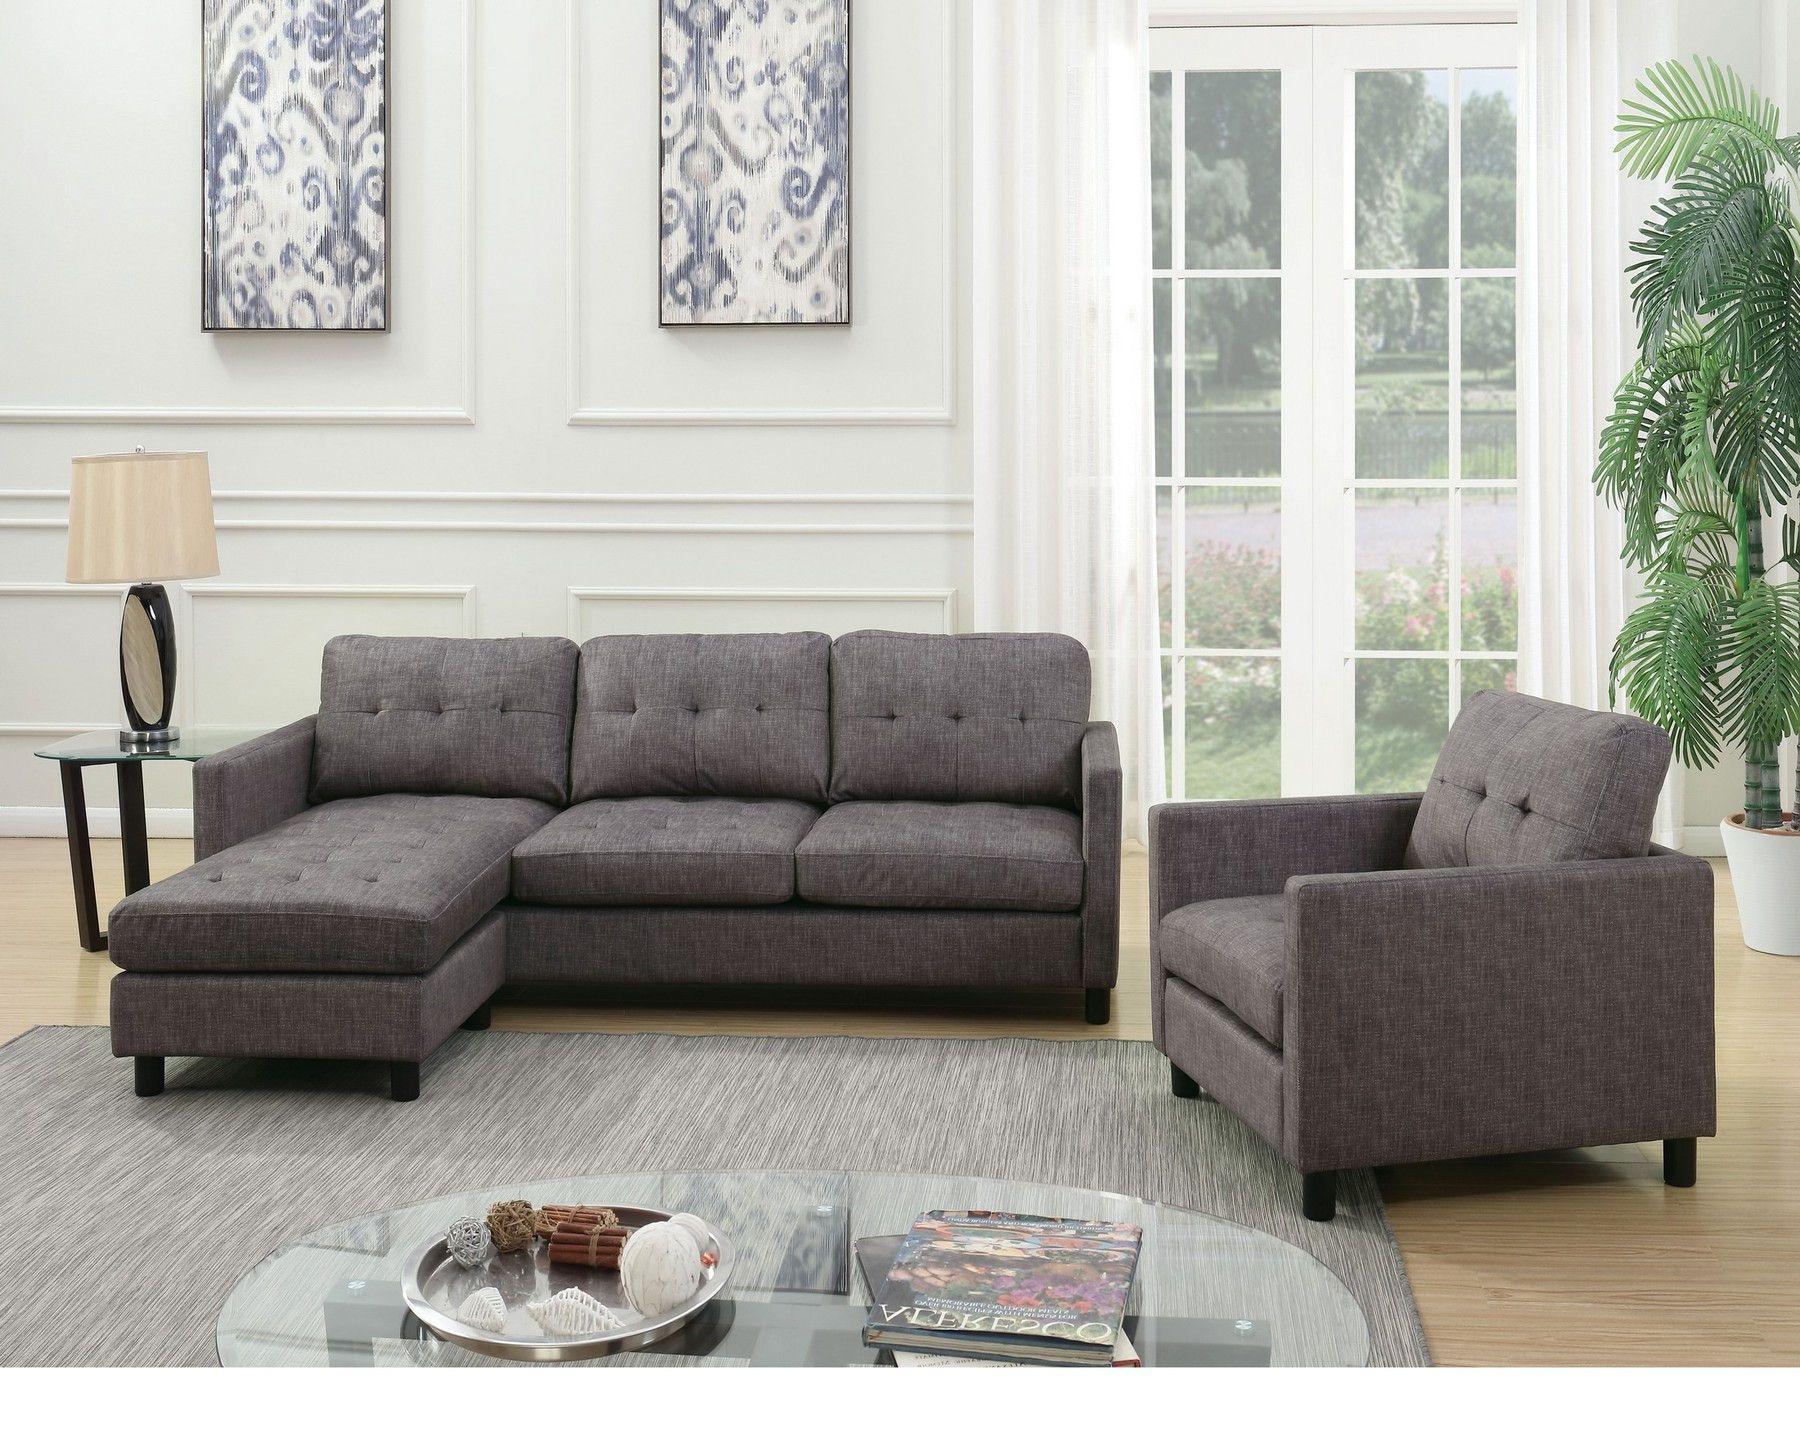 Acme Corporation Ceasar Gray Fabric Versatile Sectional